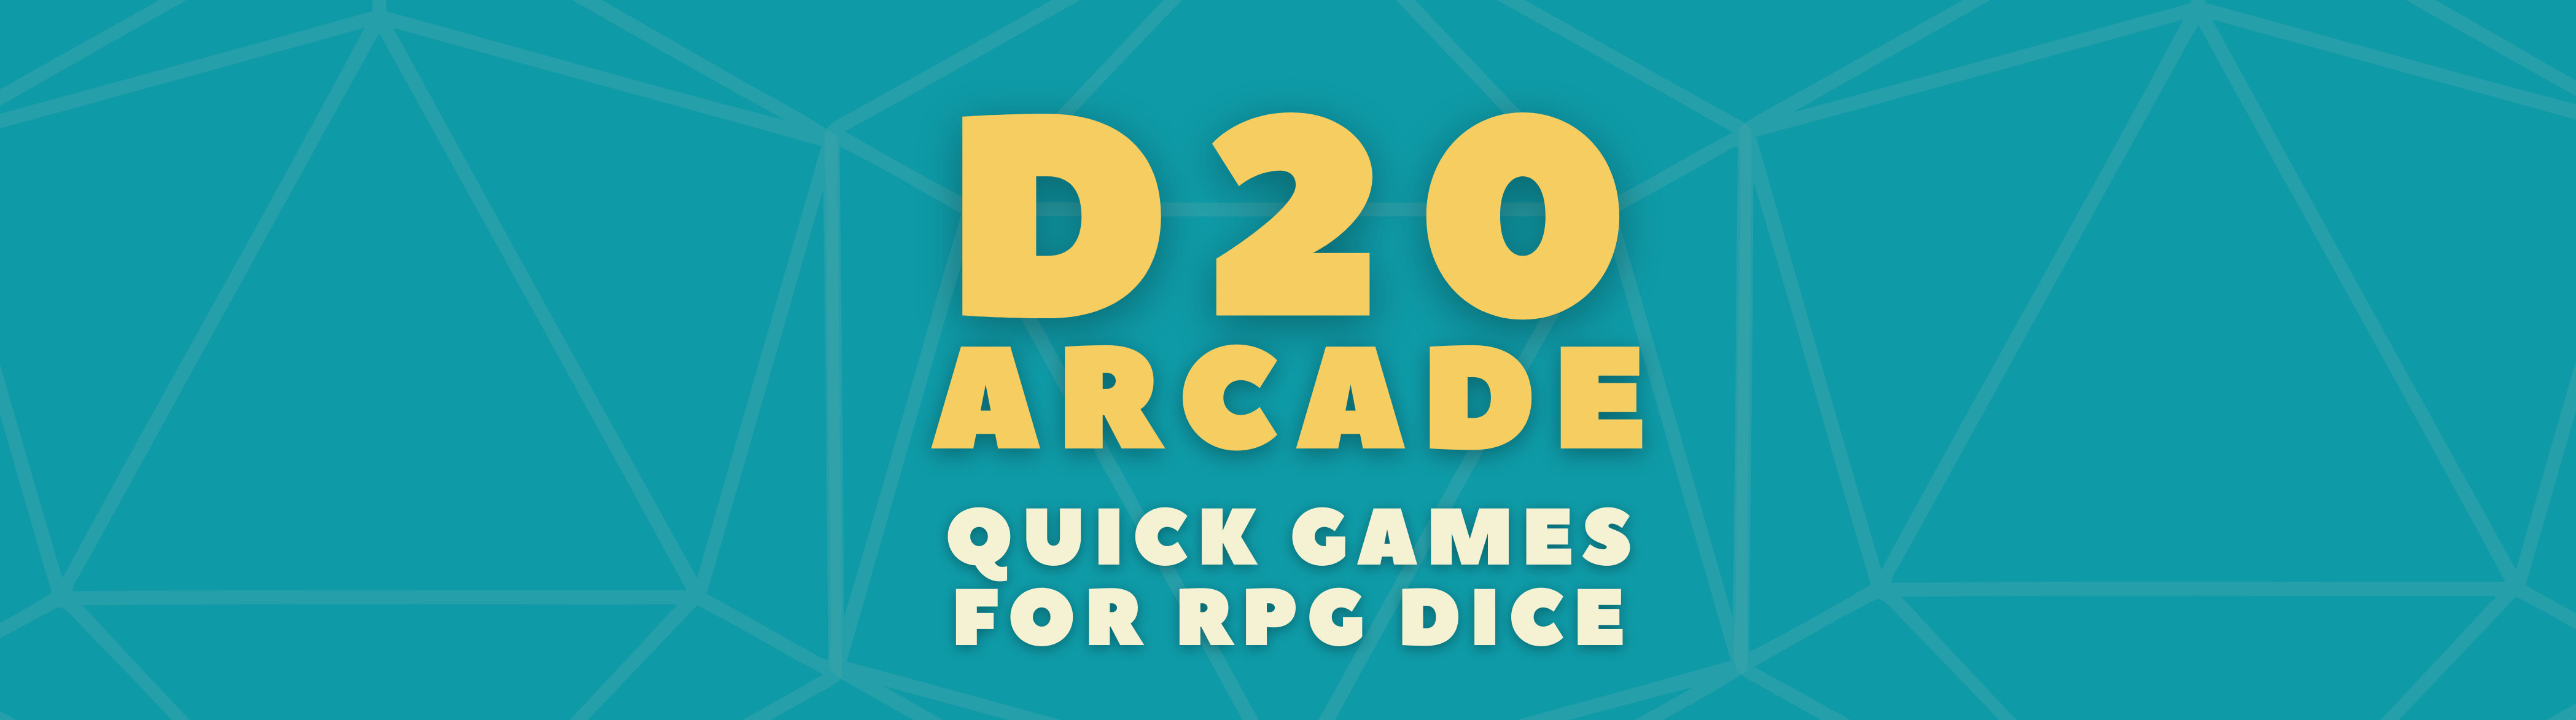 Submariner - D20 Arcade